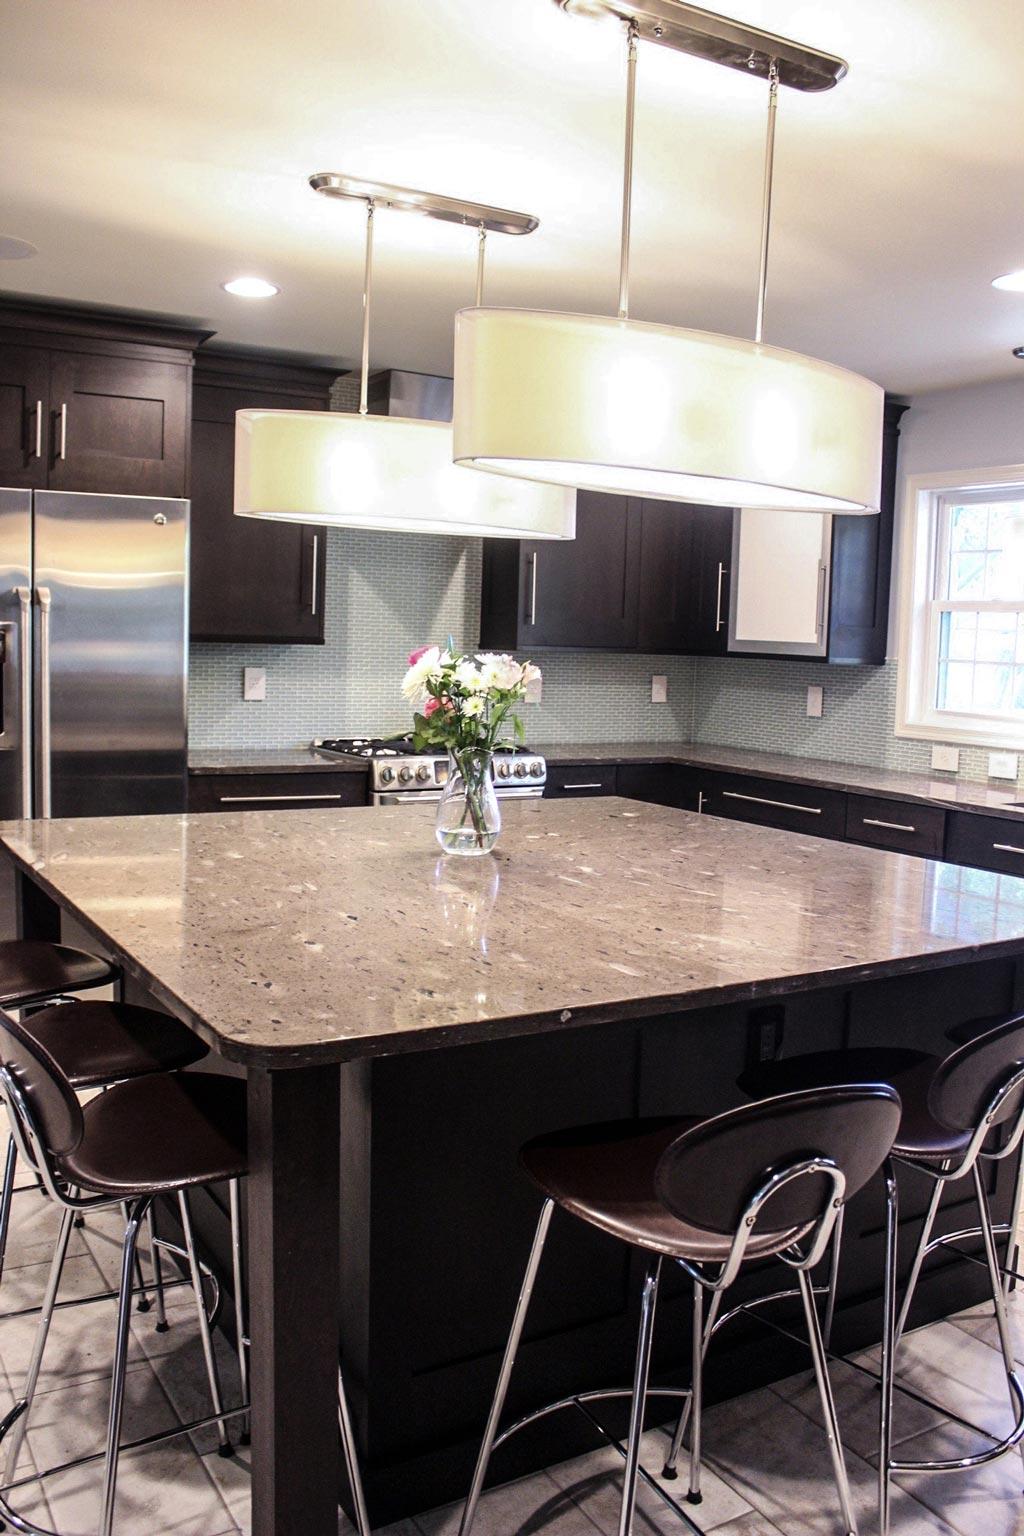 whole house renovations kitchen remodeling manassas va home remodeling vienna va